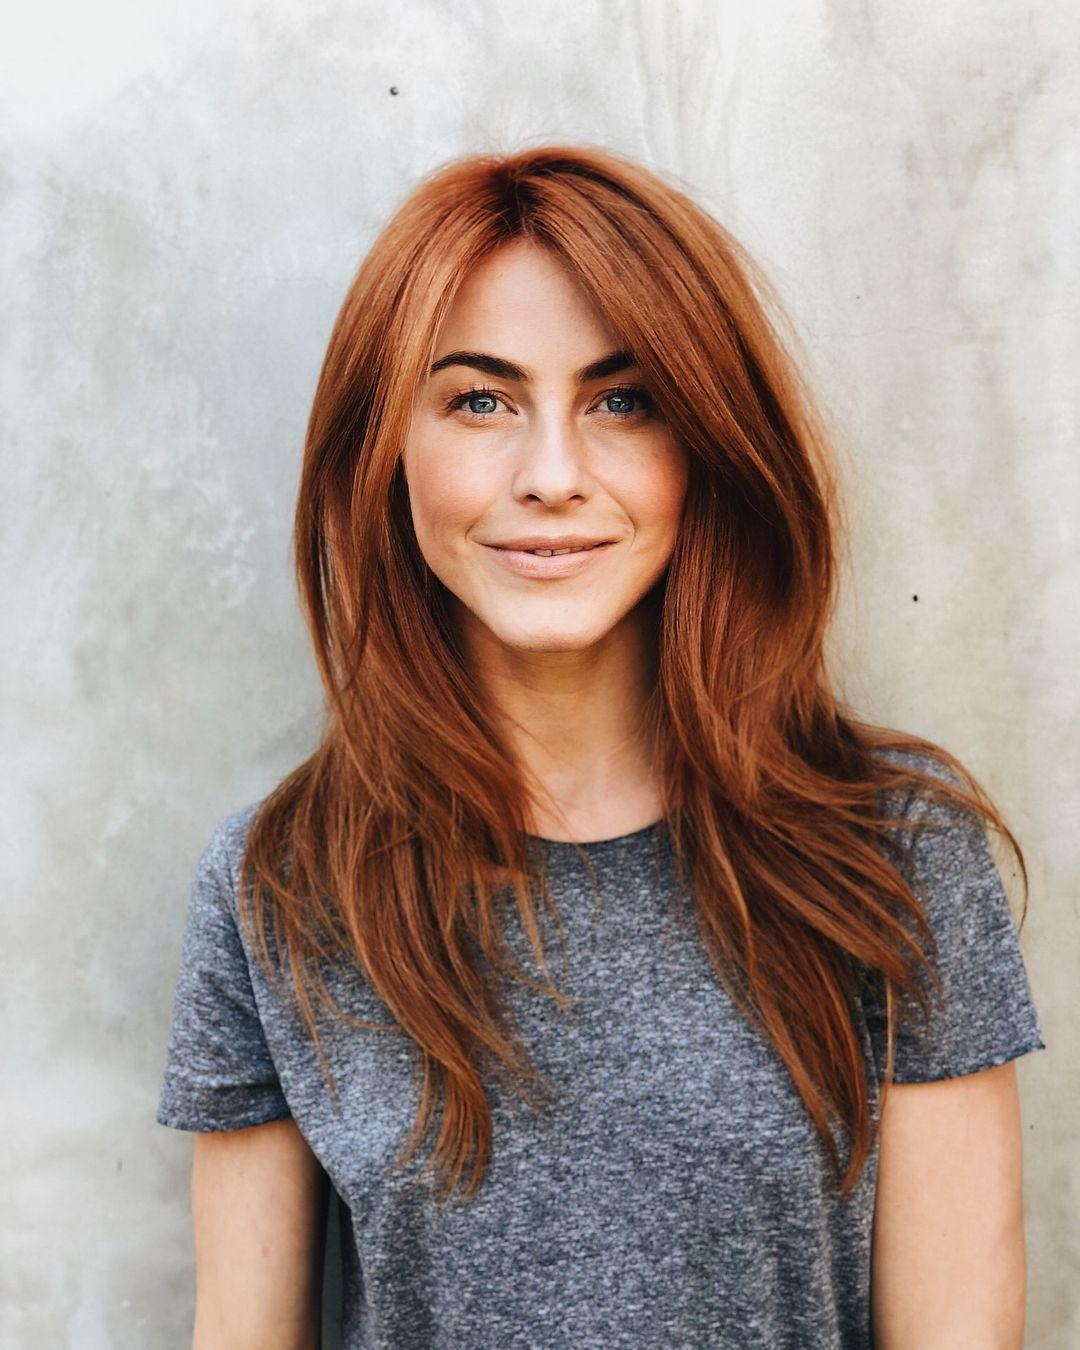 Julianne hough debuts new red hair